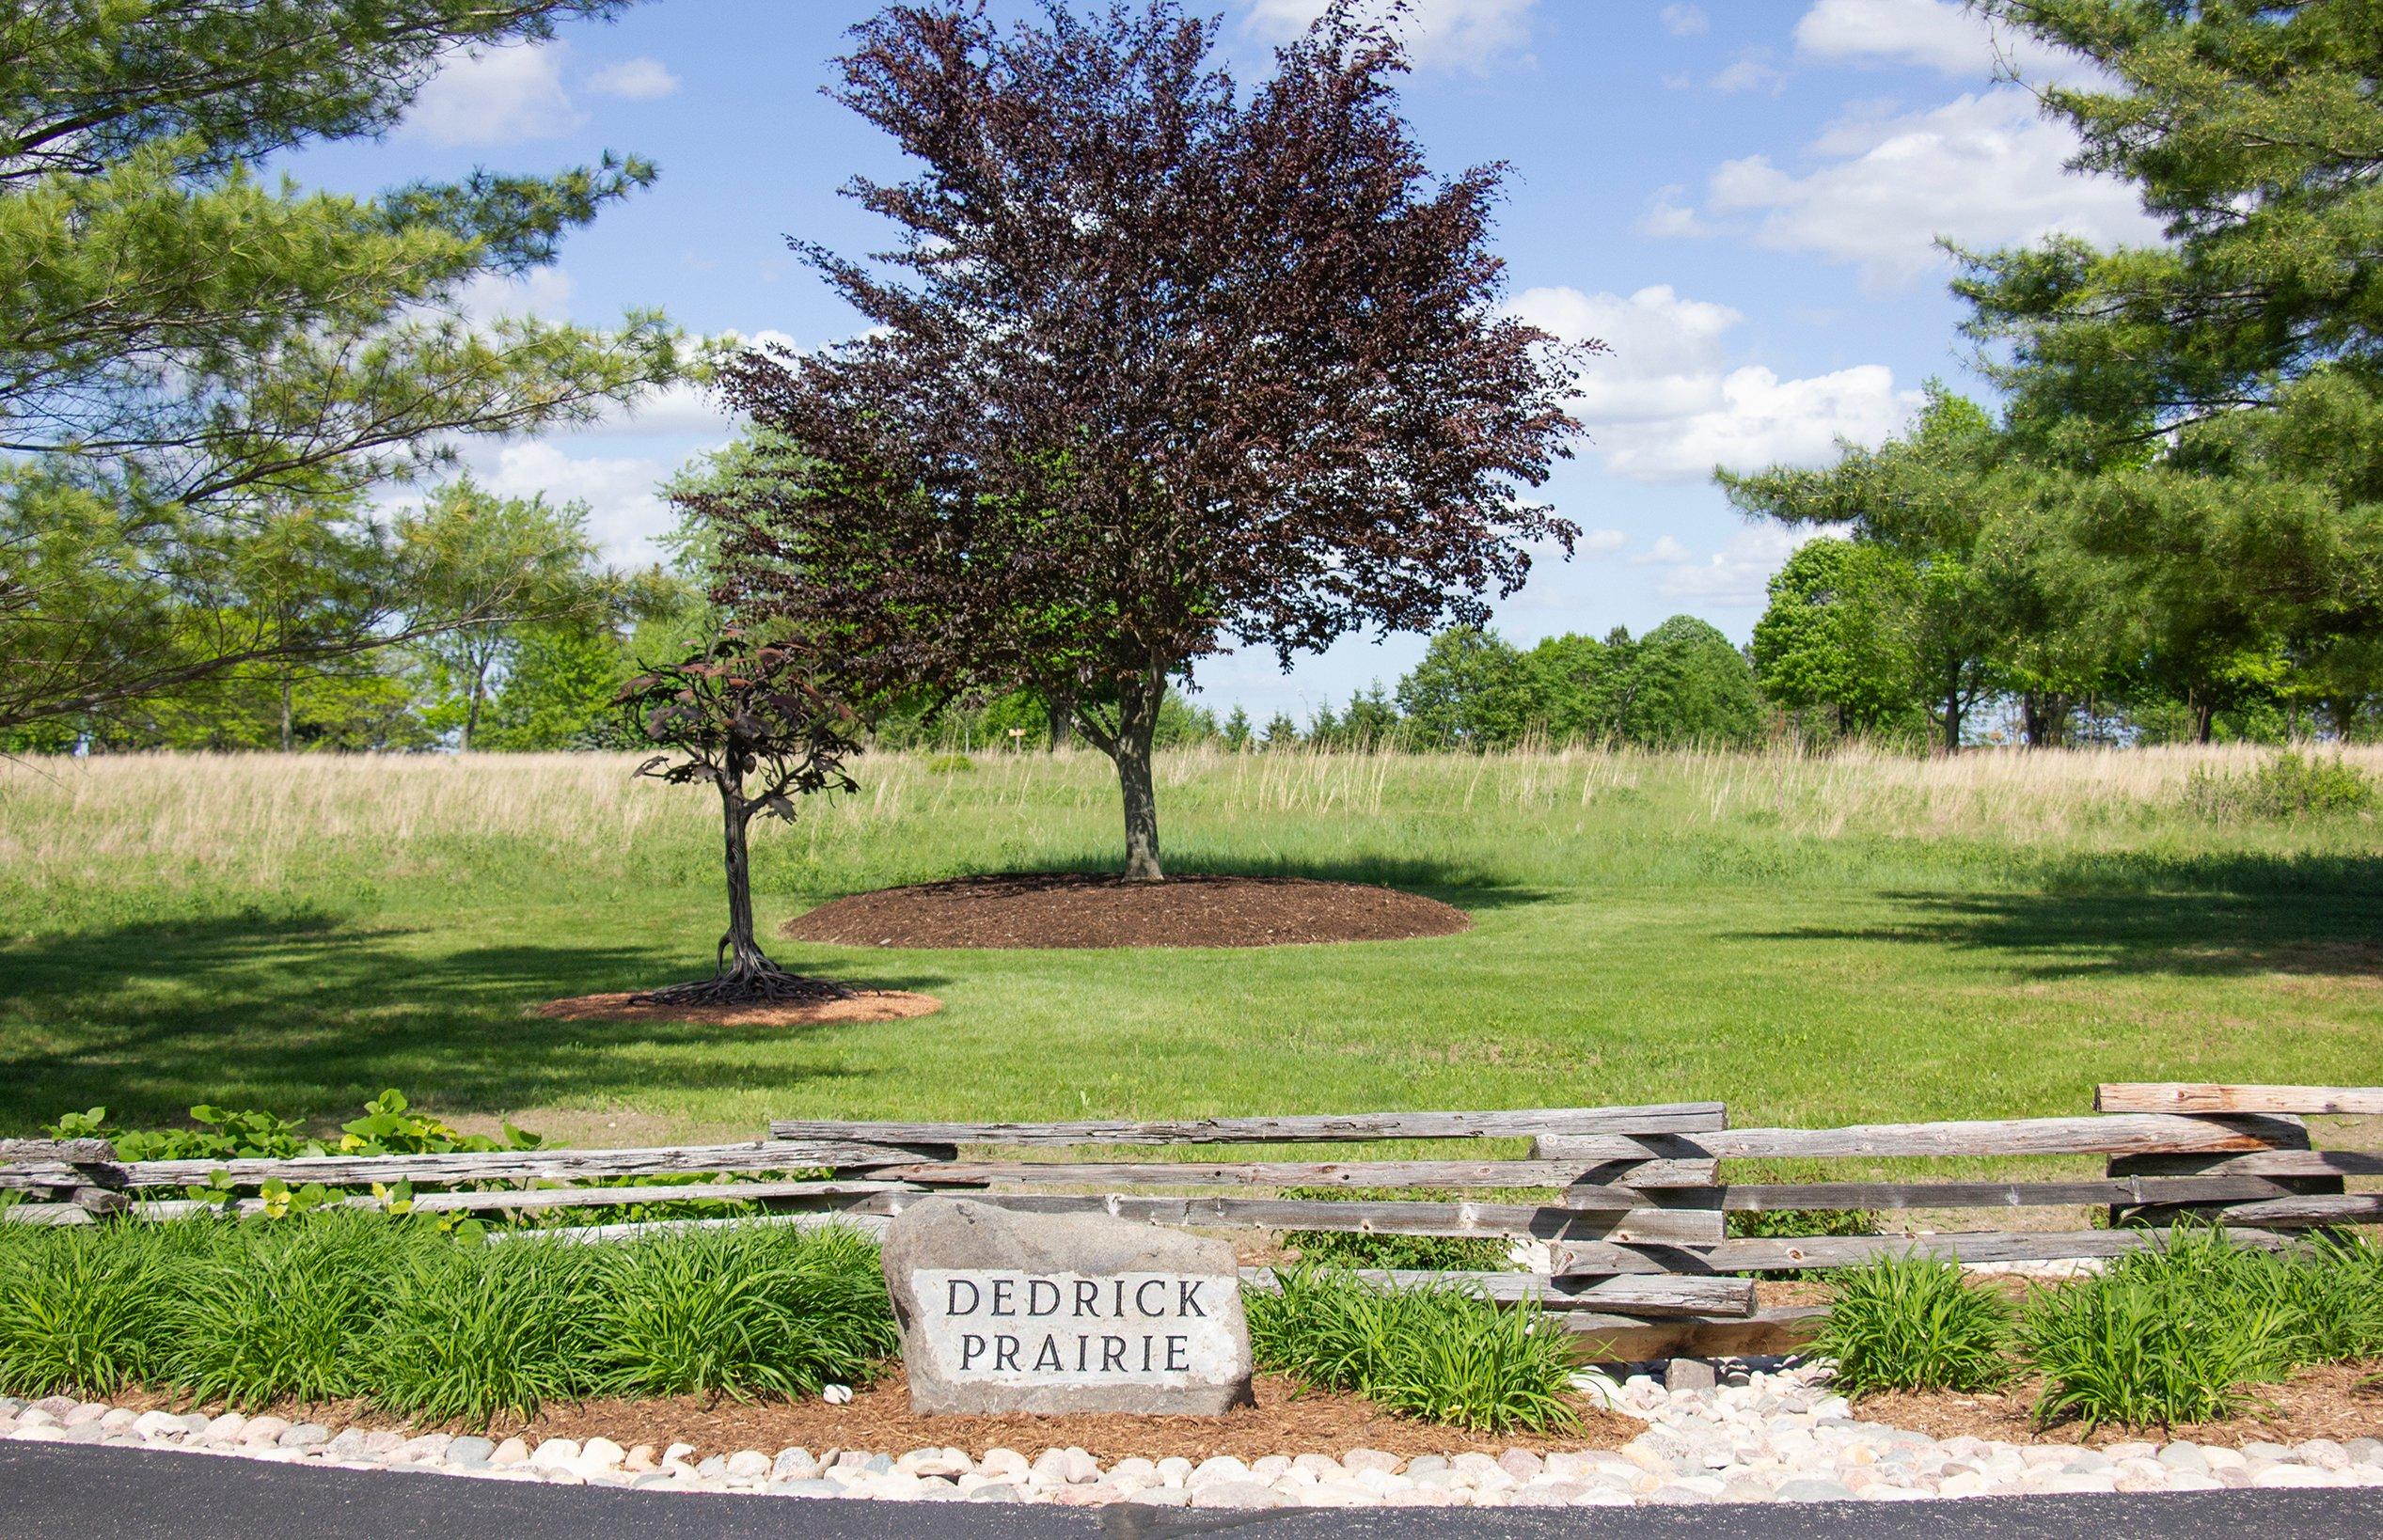 Dedrick Prairie